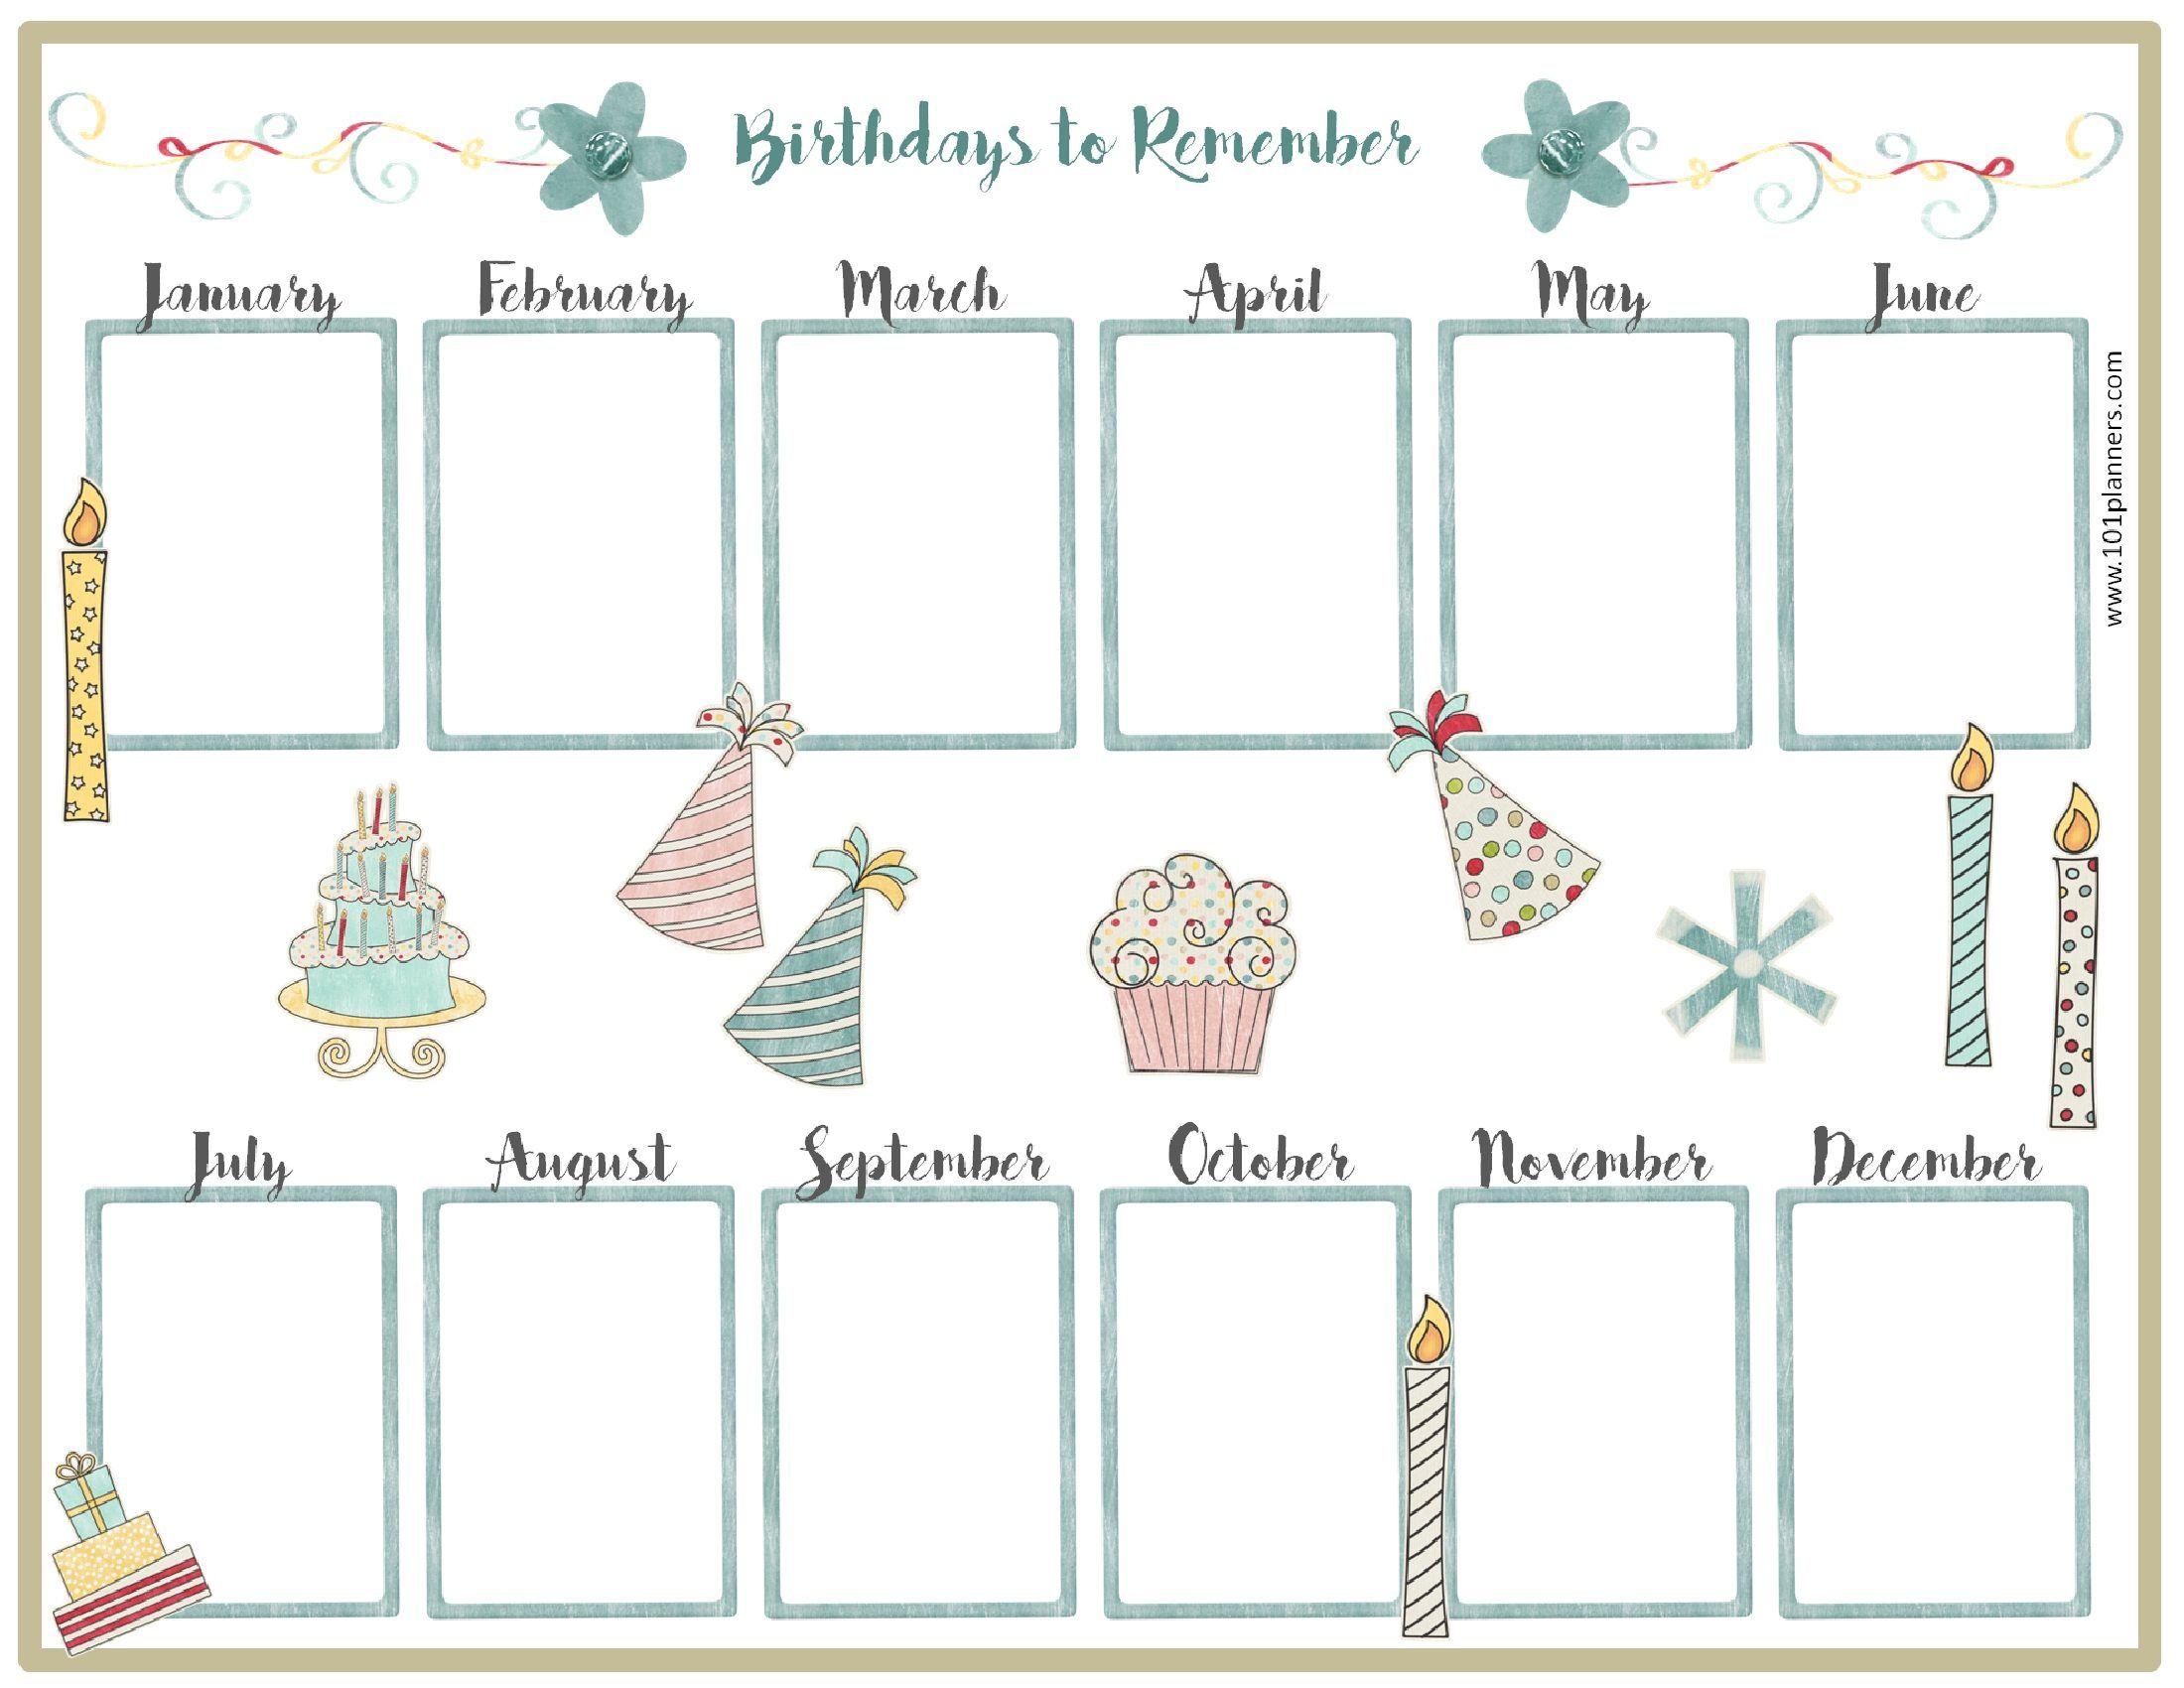 Free Birthday Calendar That Is Customizable | Birthday in Birthday Calendar Template Excel